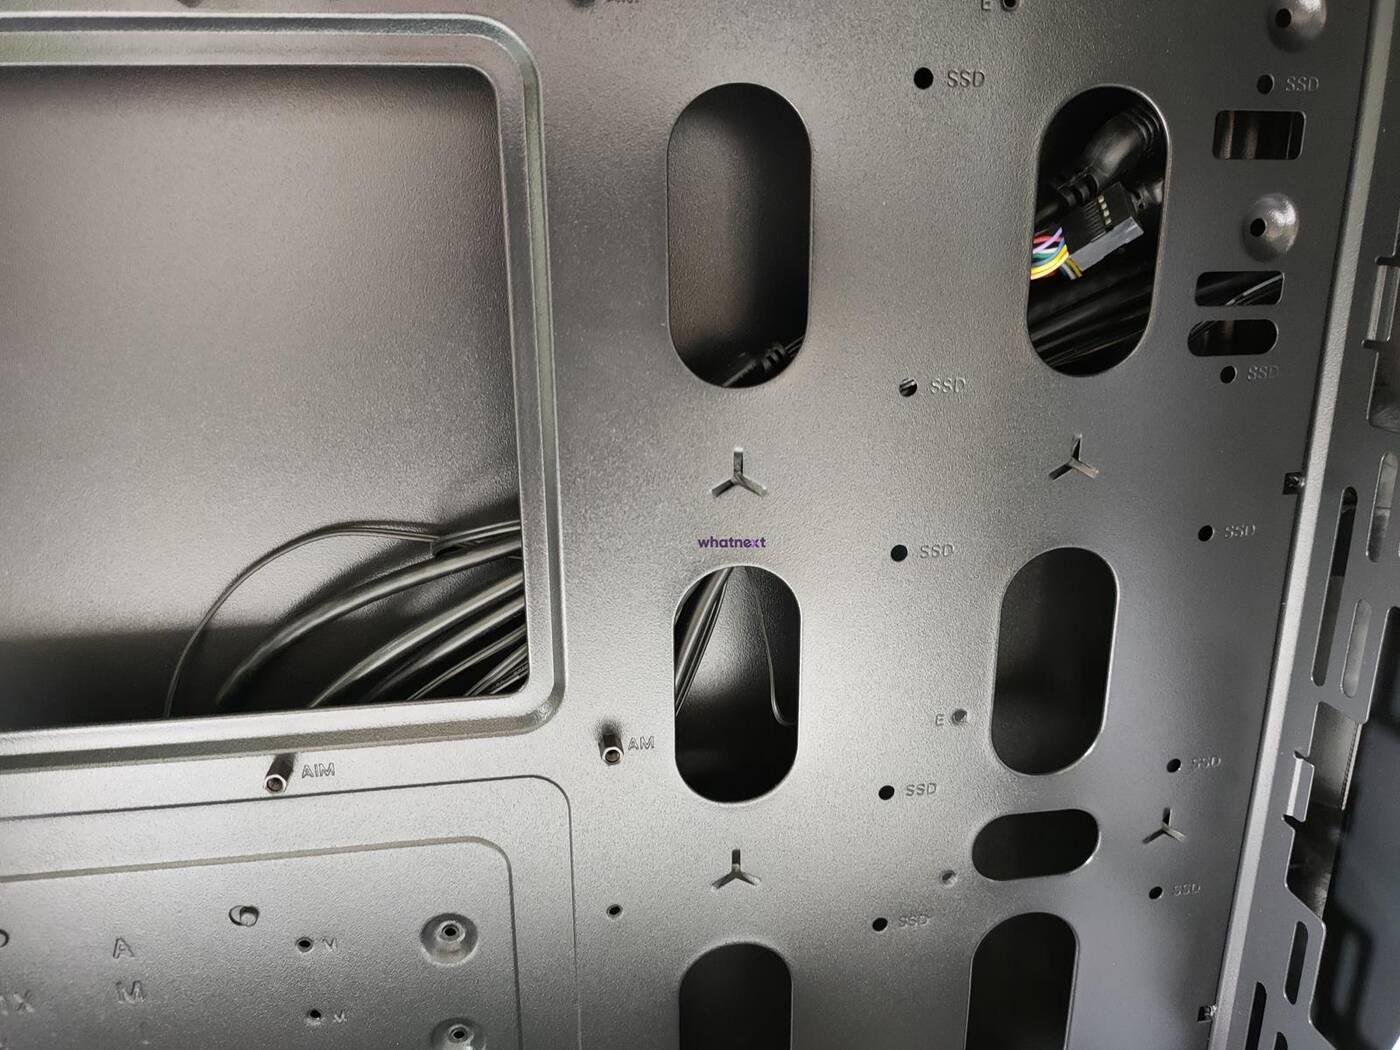 test Enermax Makashi MK50, recenzja Enermax Makashi MK50, review Enermax Makashi MK50, opinia Enermax Makashi MK50, cena Enermax Makashi MK50